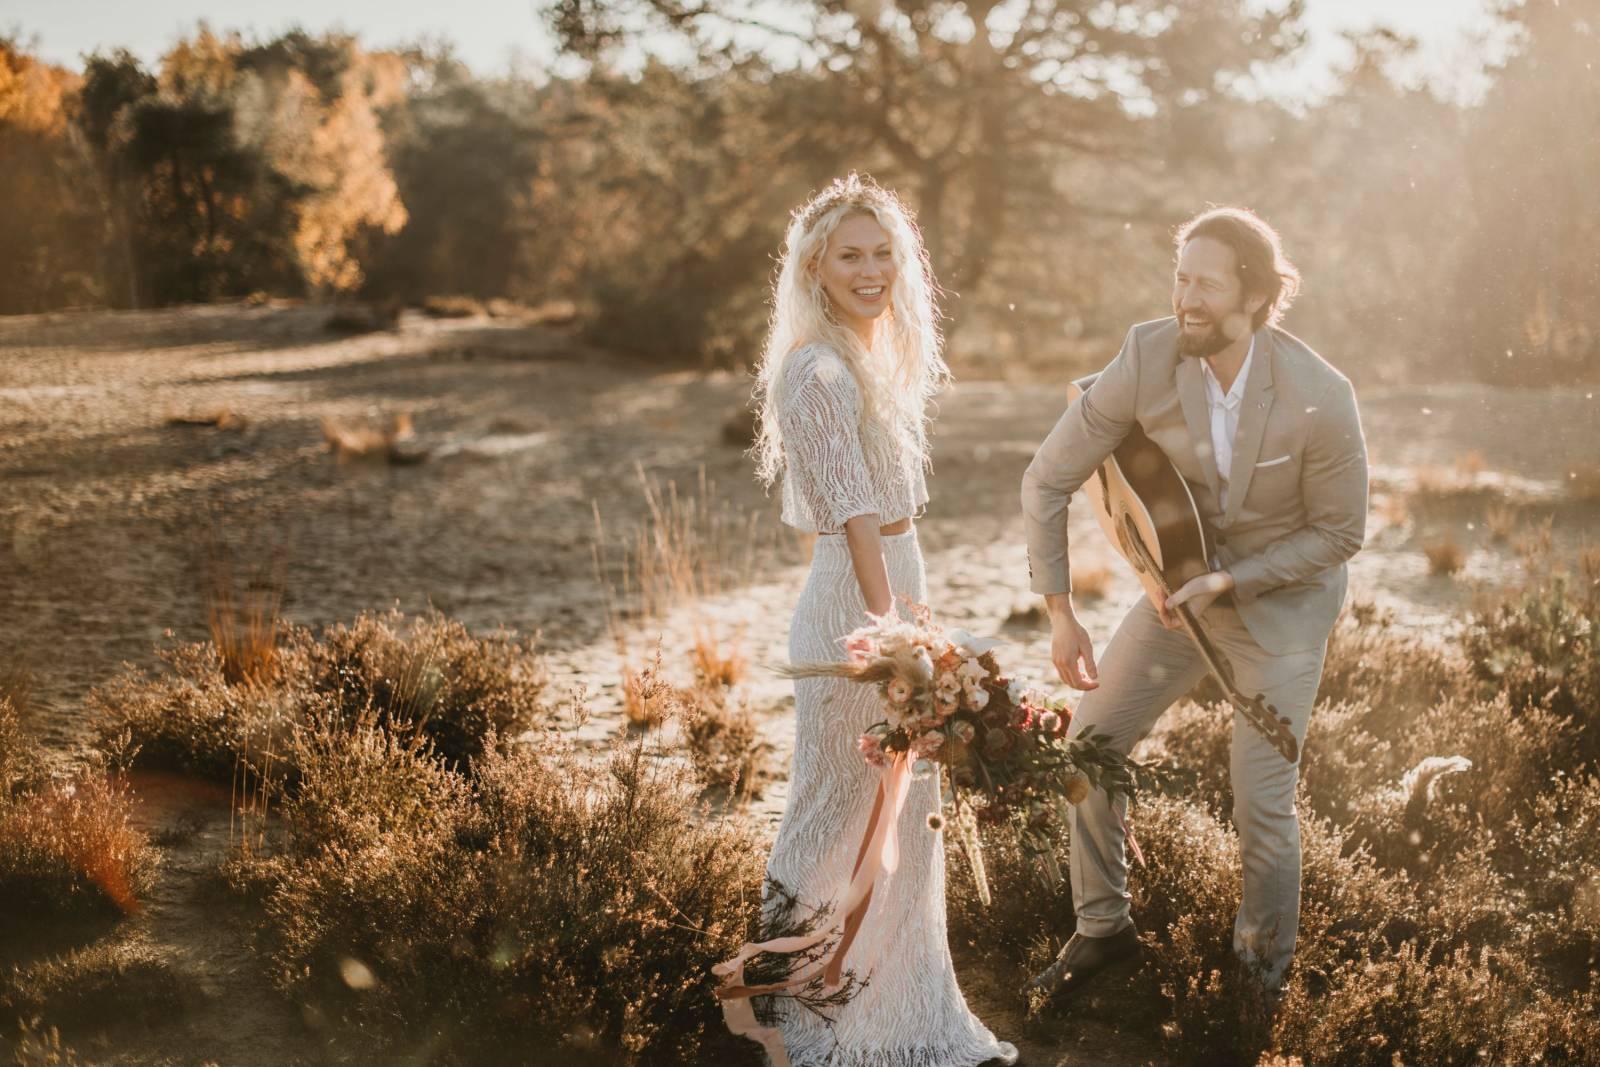 Collart & Willems - Beauty - Bruidsmake-up - Make-up Bruid - House of Weddings - 10